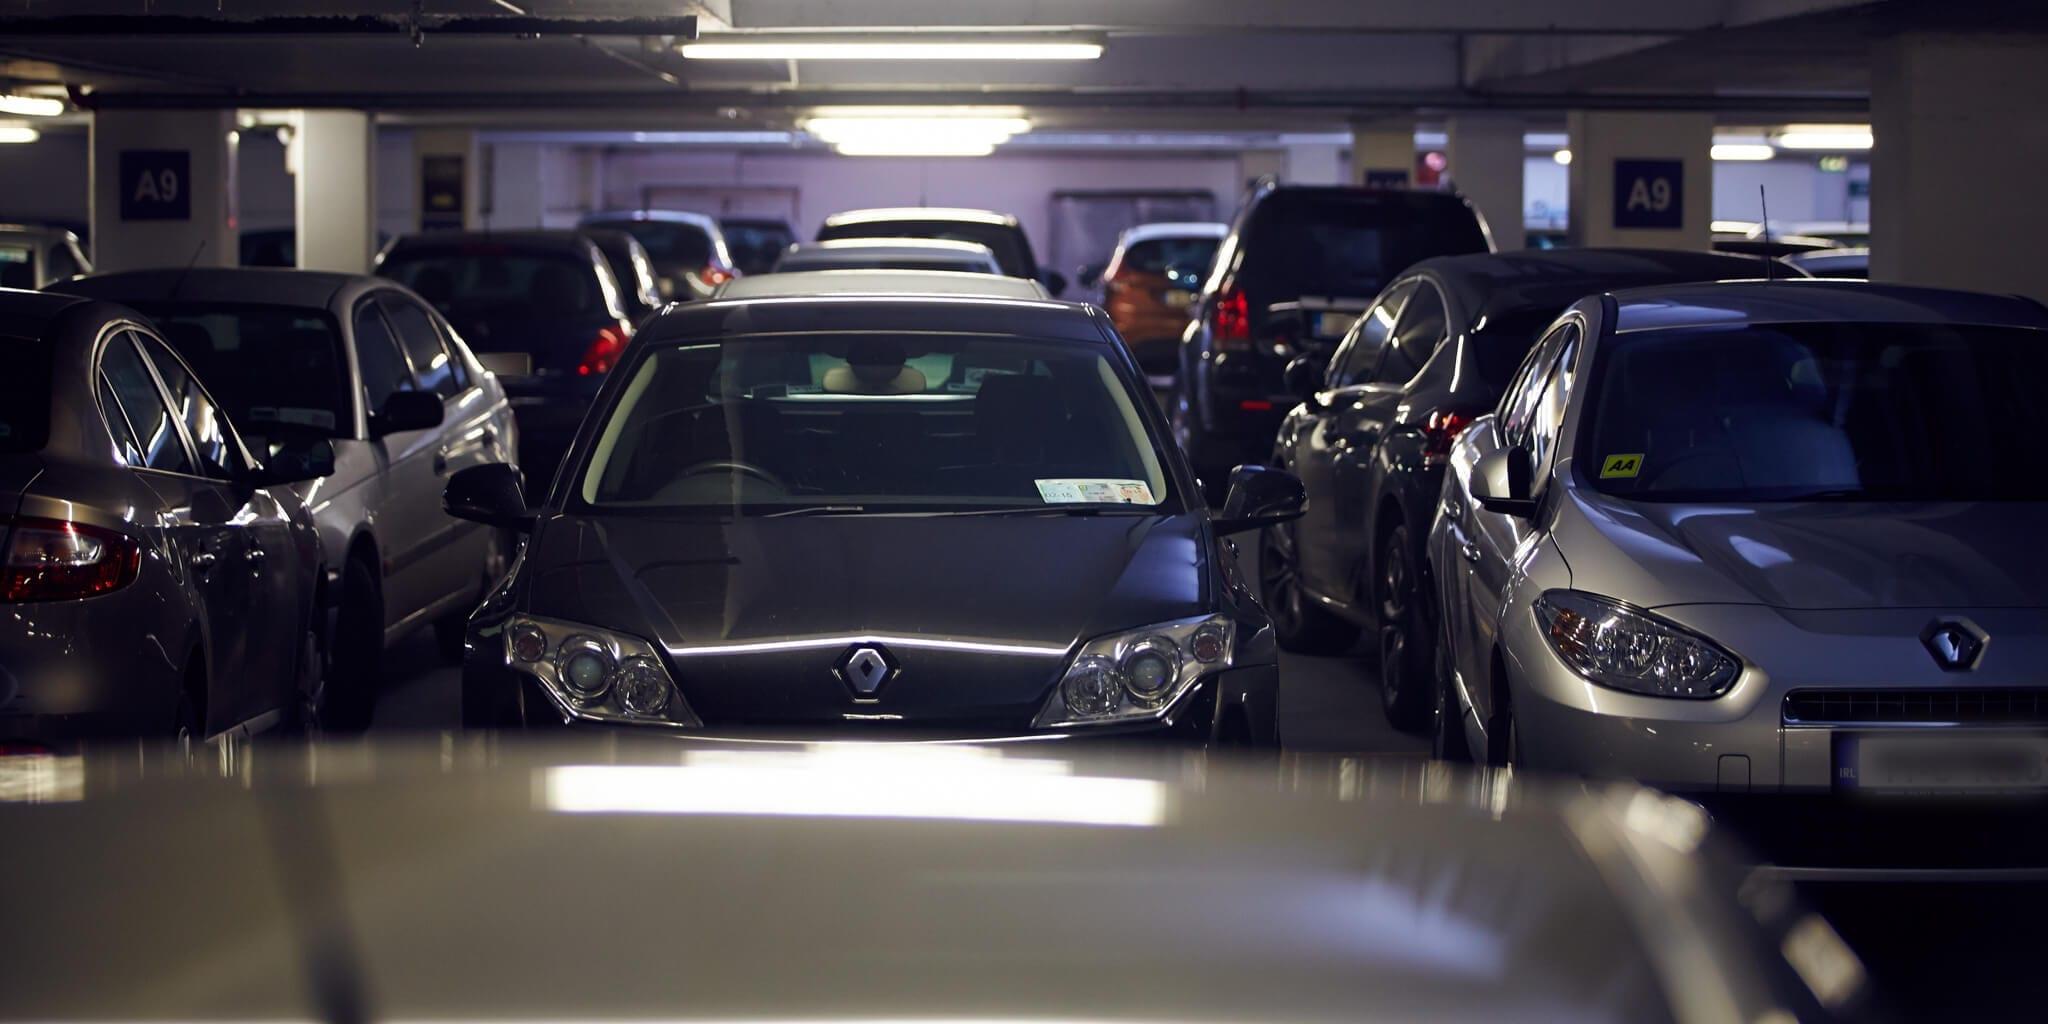 dublin-airport-car-park